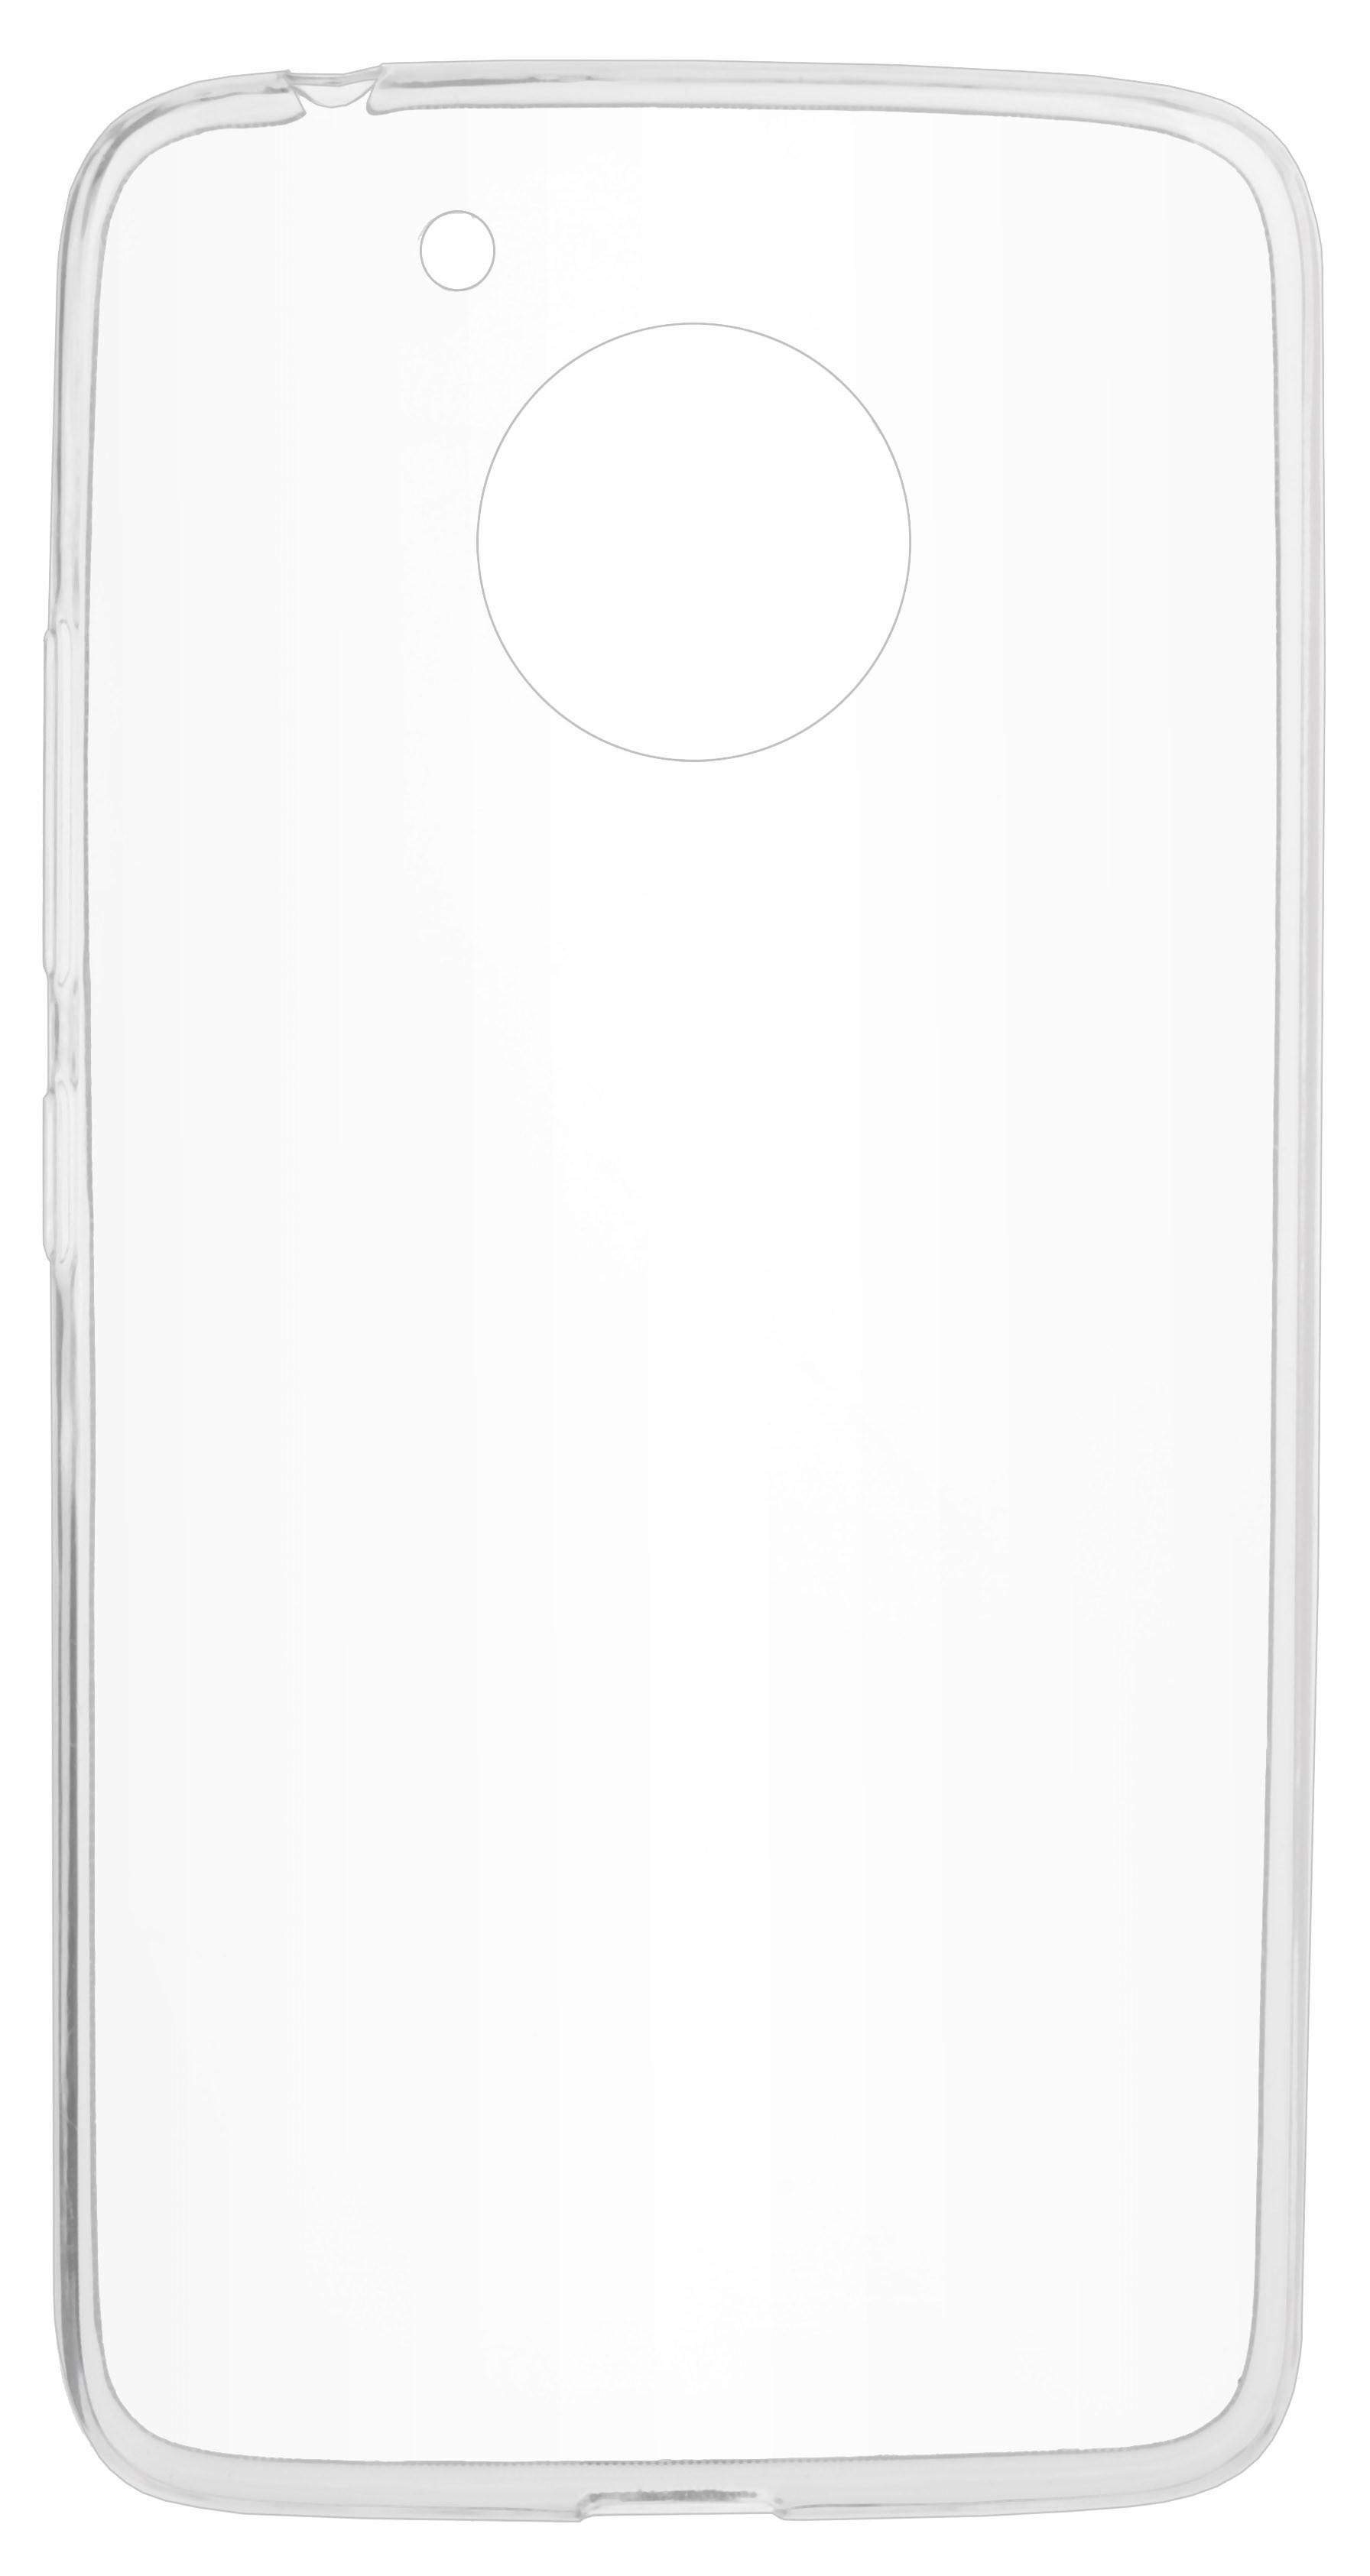 Чехол для сотового телефона skinBOX Slim Silicone, 4630042529830, прозрачный цена и фото